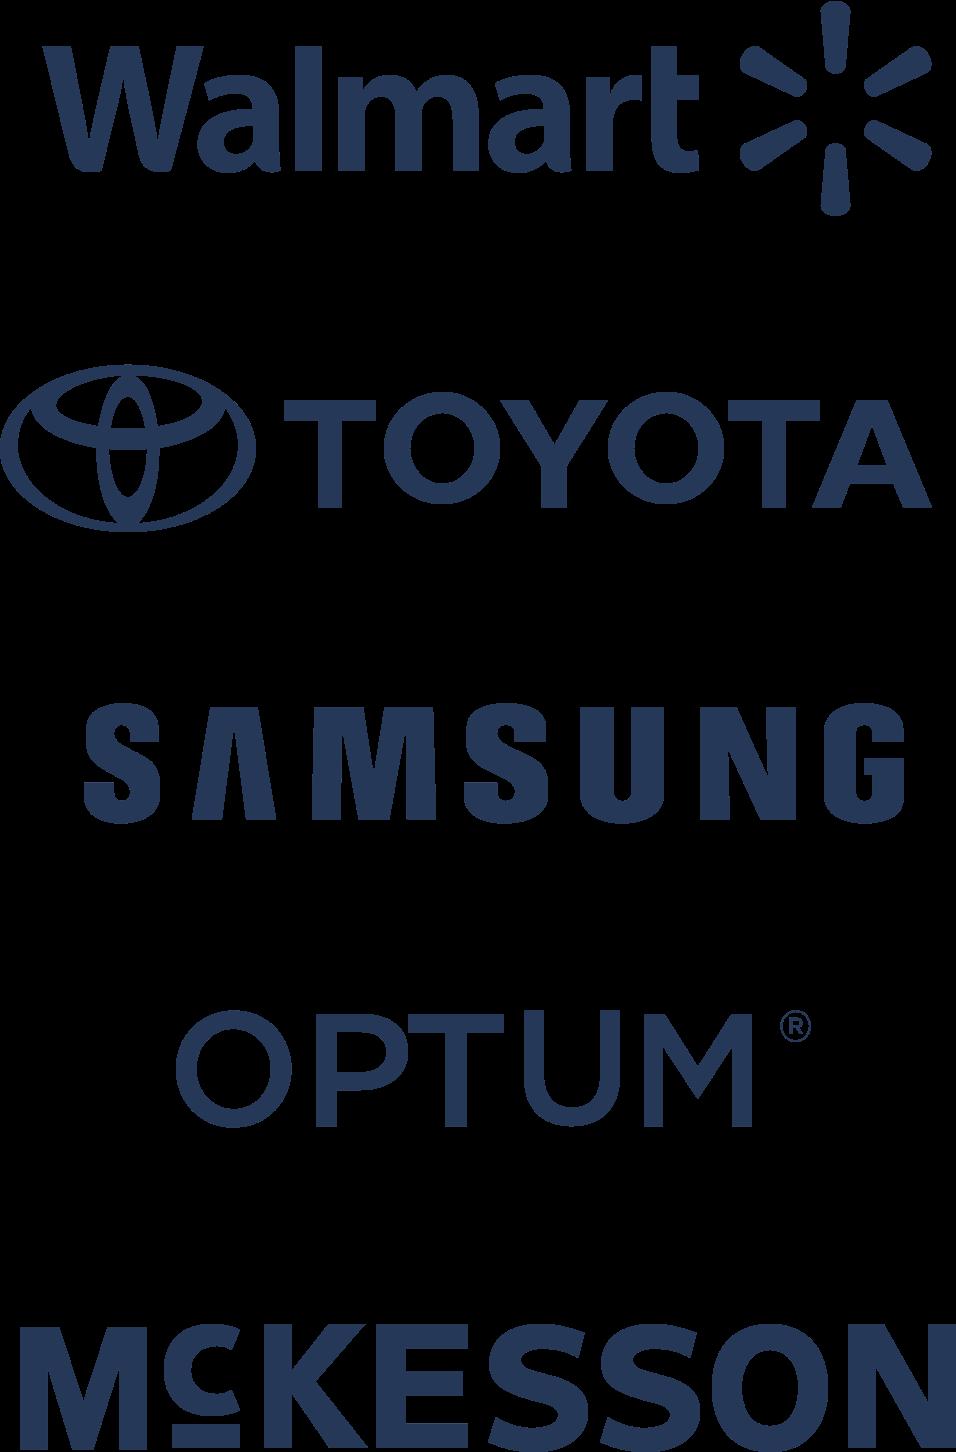 Walmart, Toyota, Samsung, Optum, McKesson logos